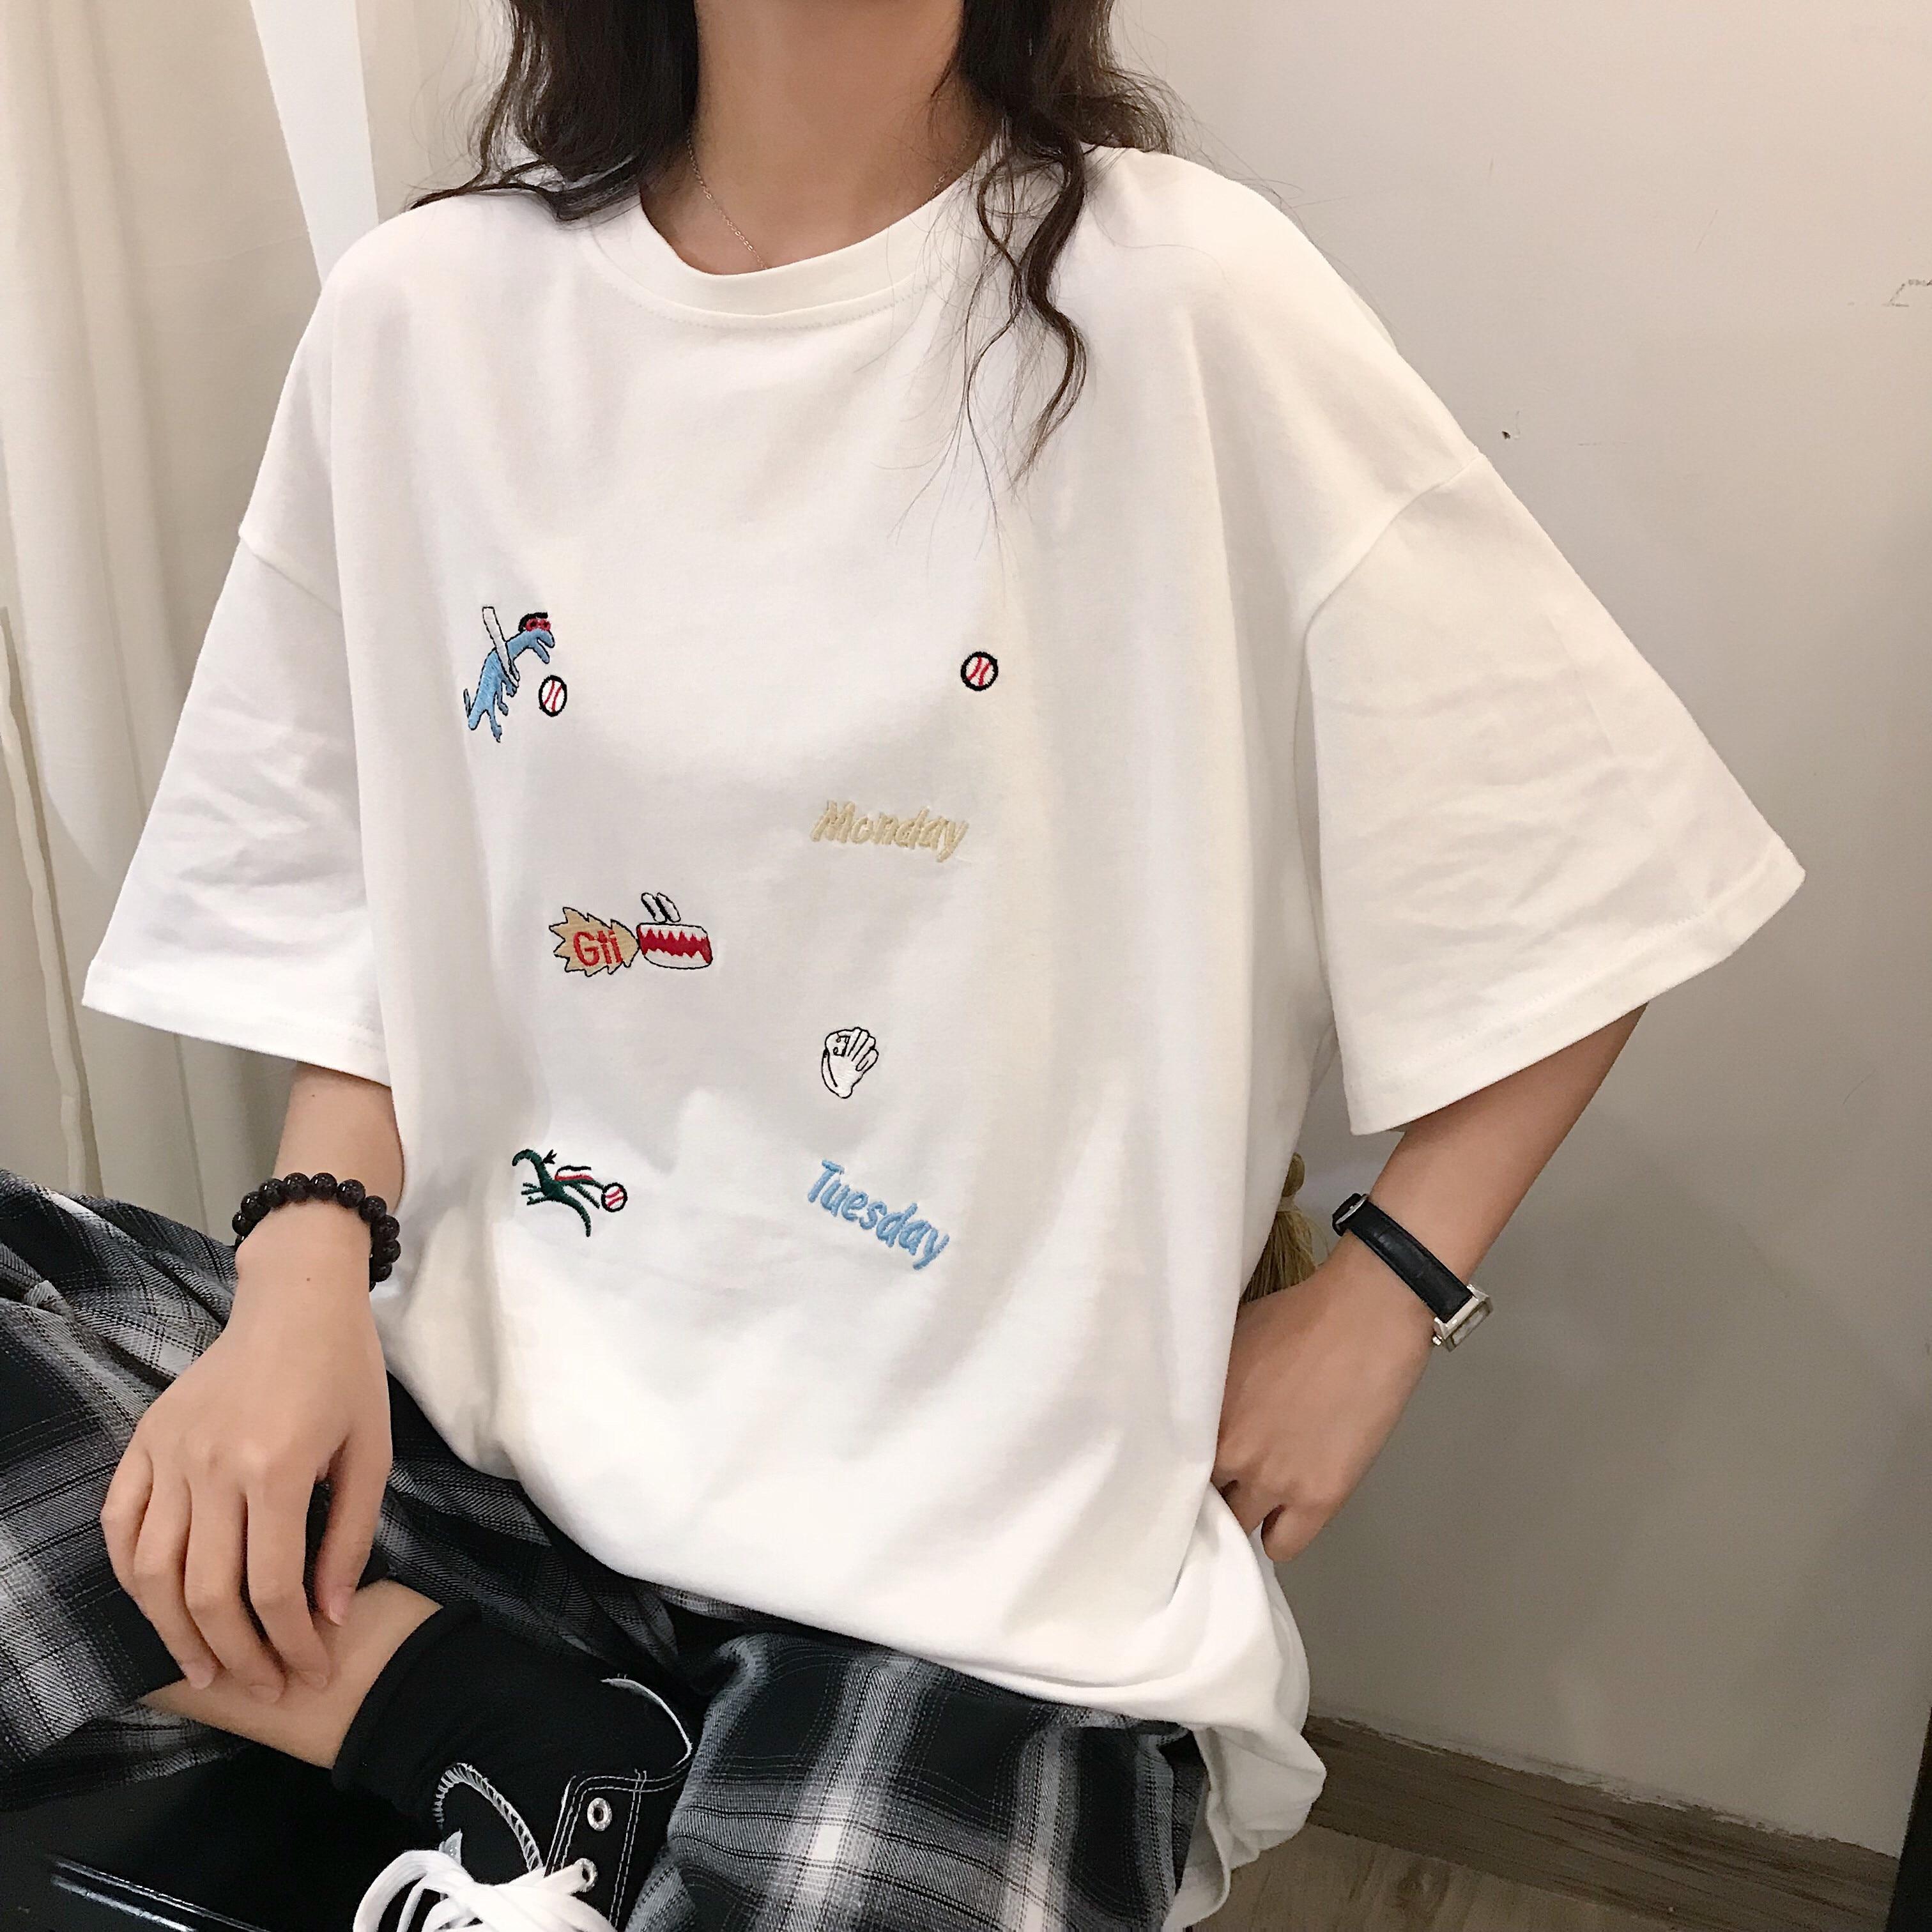 Women's Funny Cartoon Embroidered Short-sleeved Loose T-shirt Women Summer Top